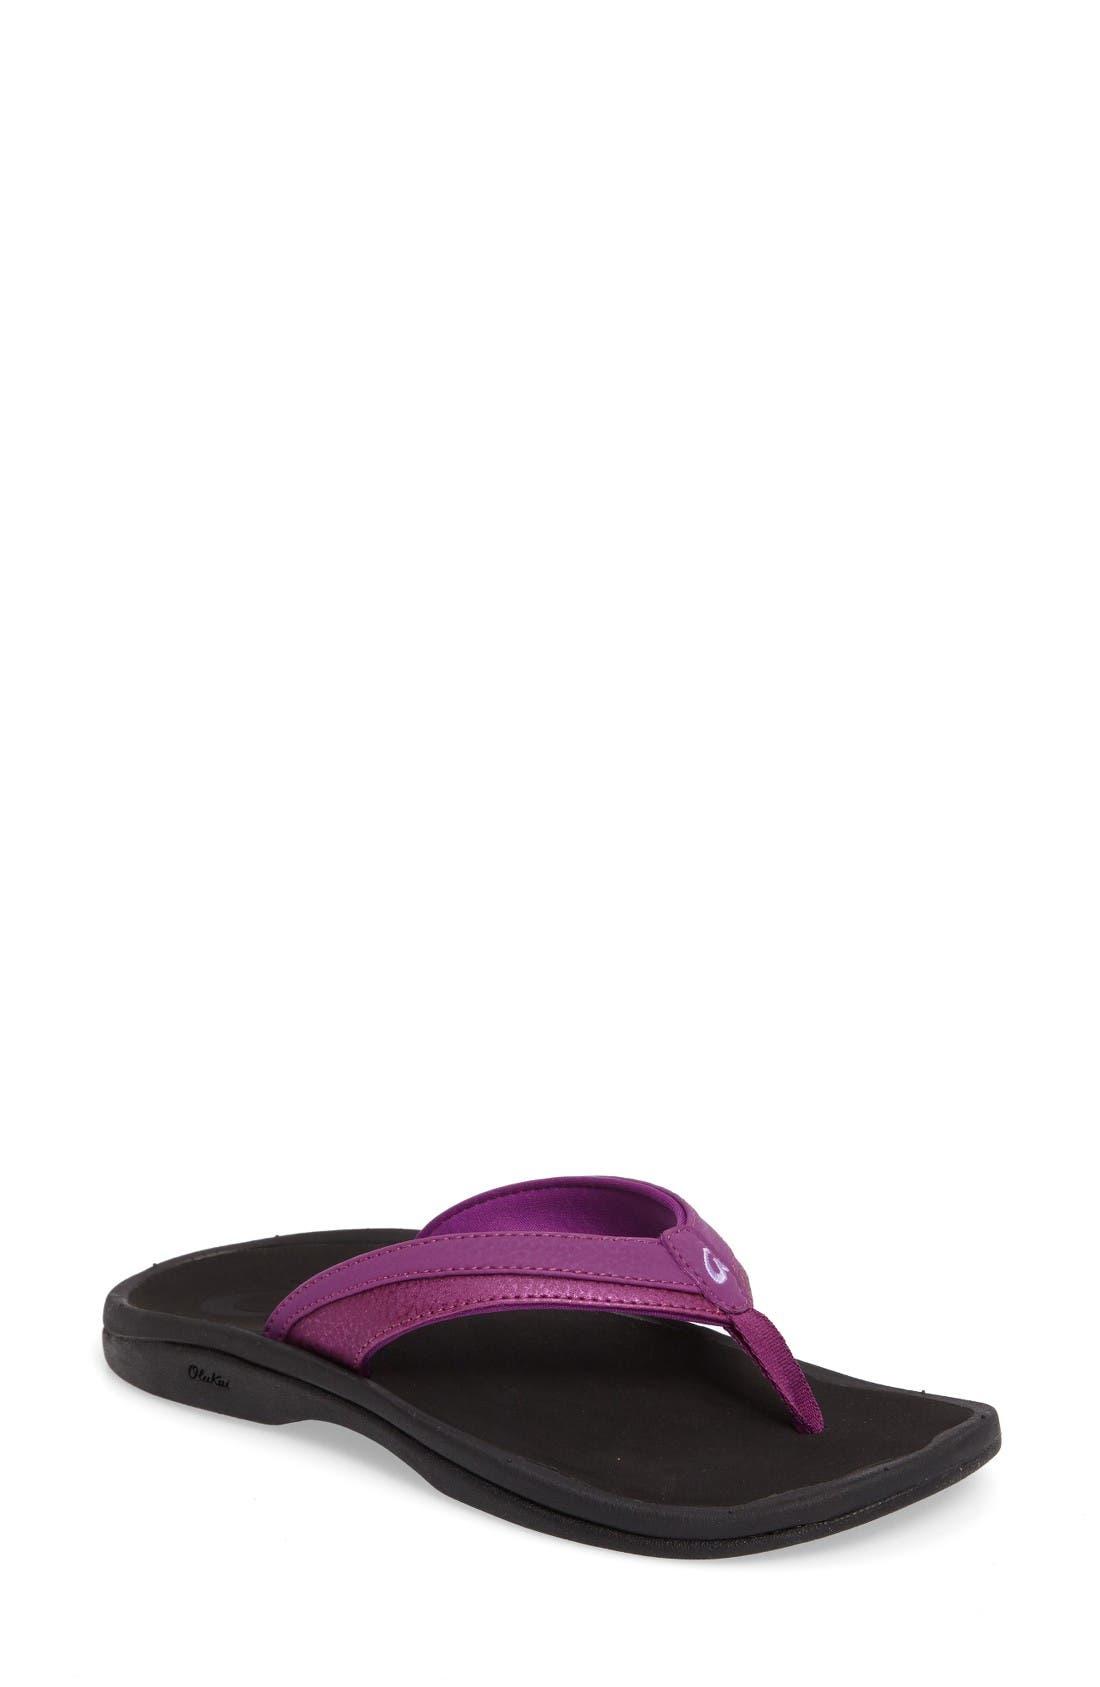 Ohana Sandal,                         Main,                         color, Dahlia/ Black Faux Leather